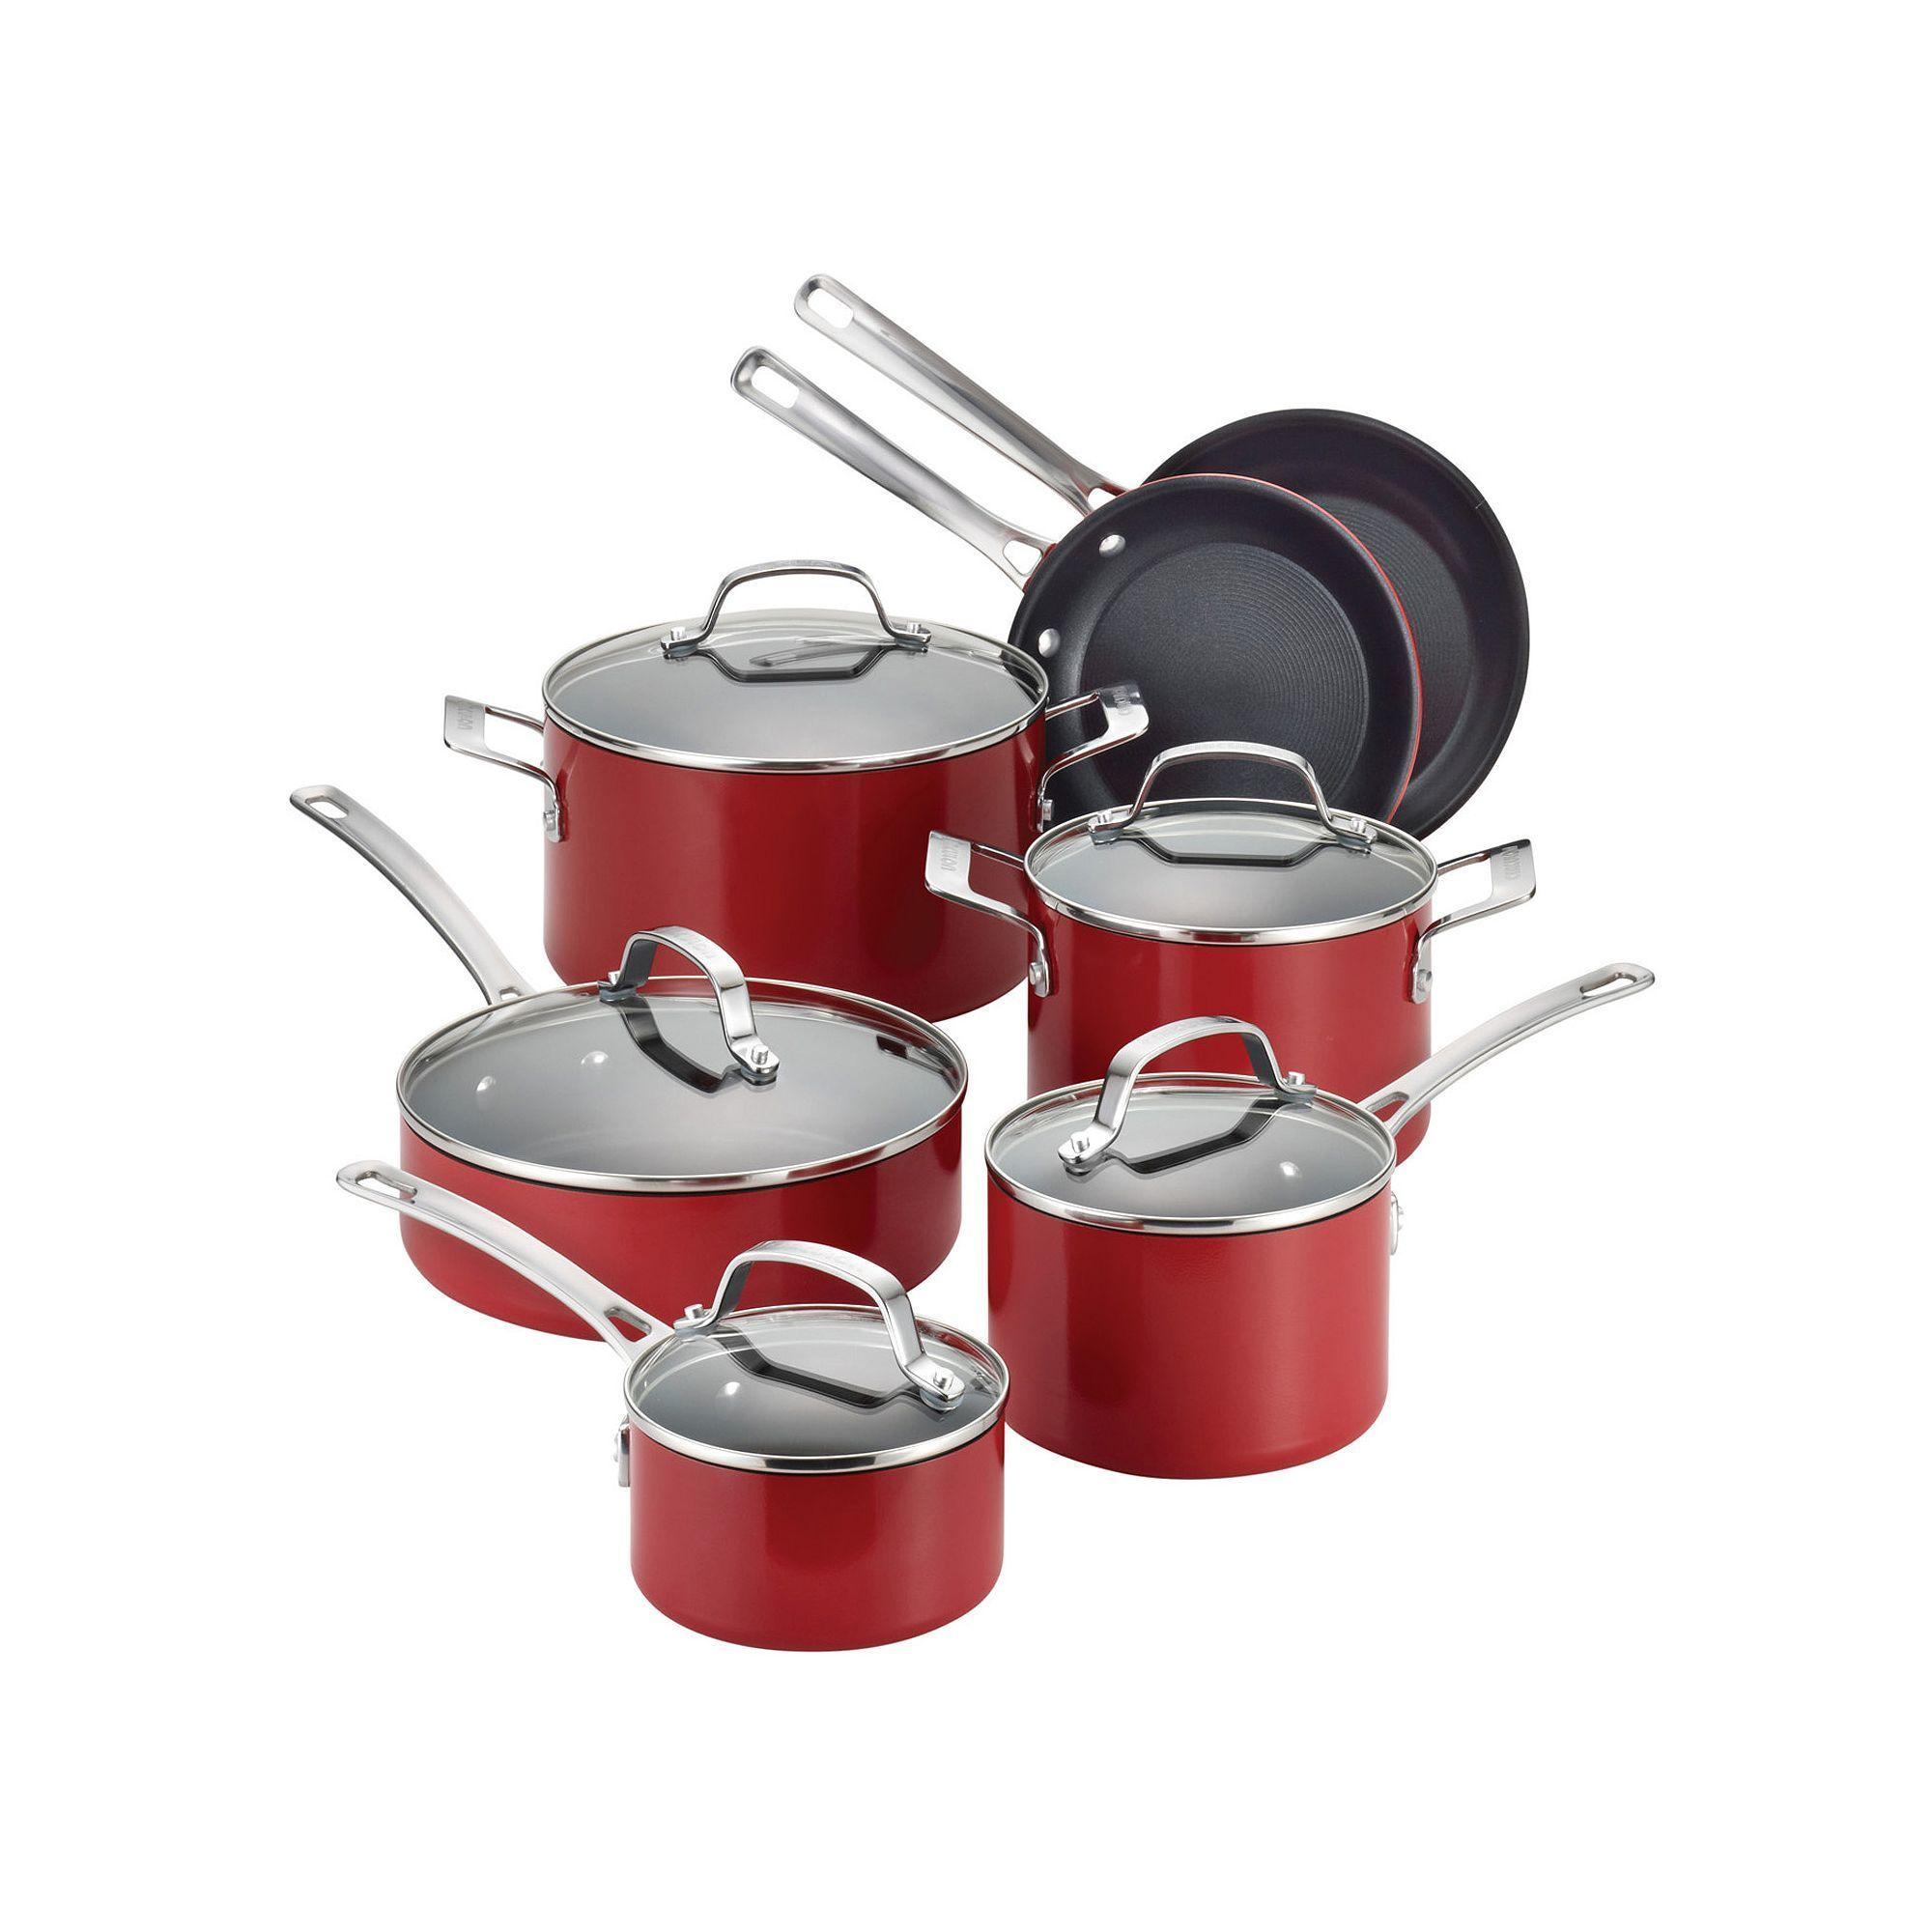 Circulon genesis 12pc nonstick aluminum cookware set